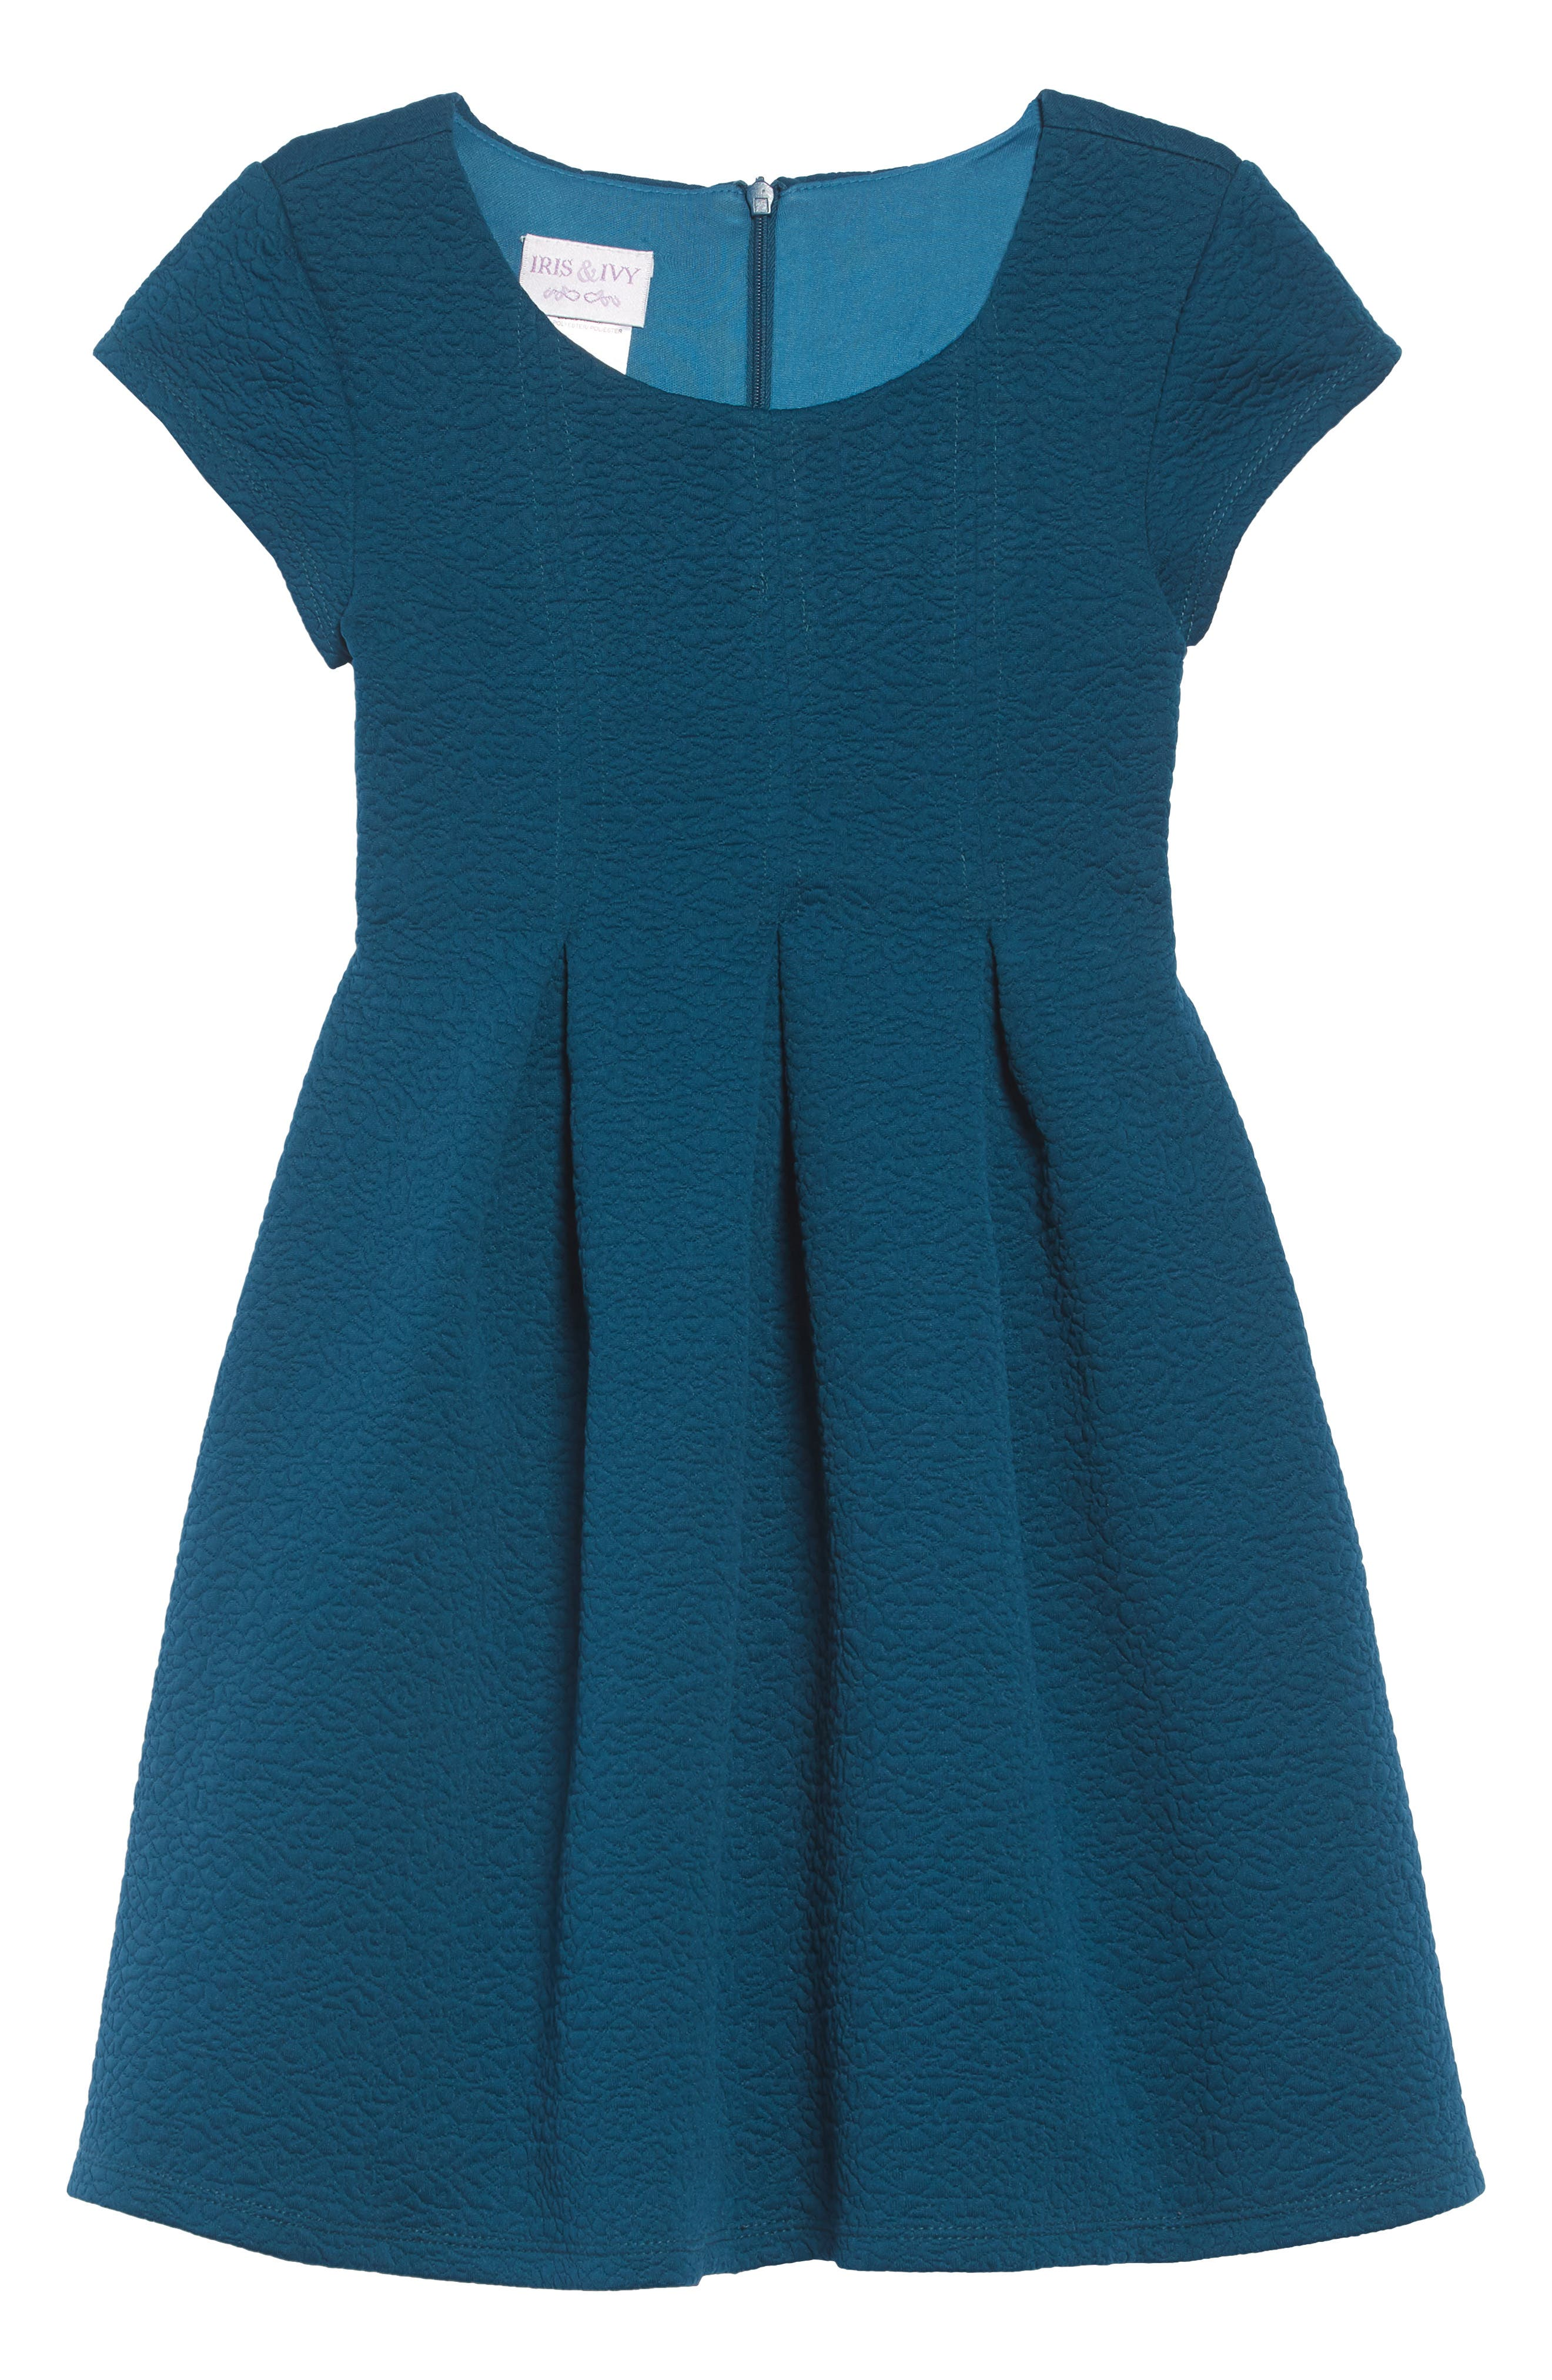 Textured Skater Dress,                             Main thumbnail 1, color,                             PEACOCK